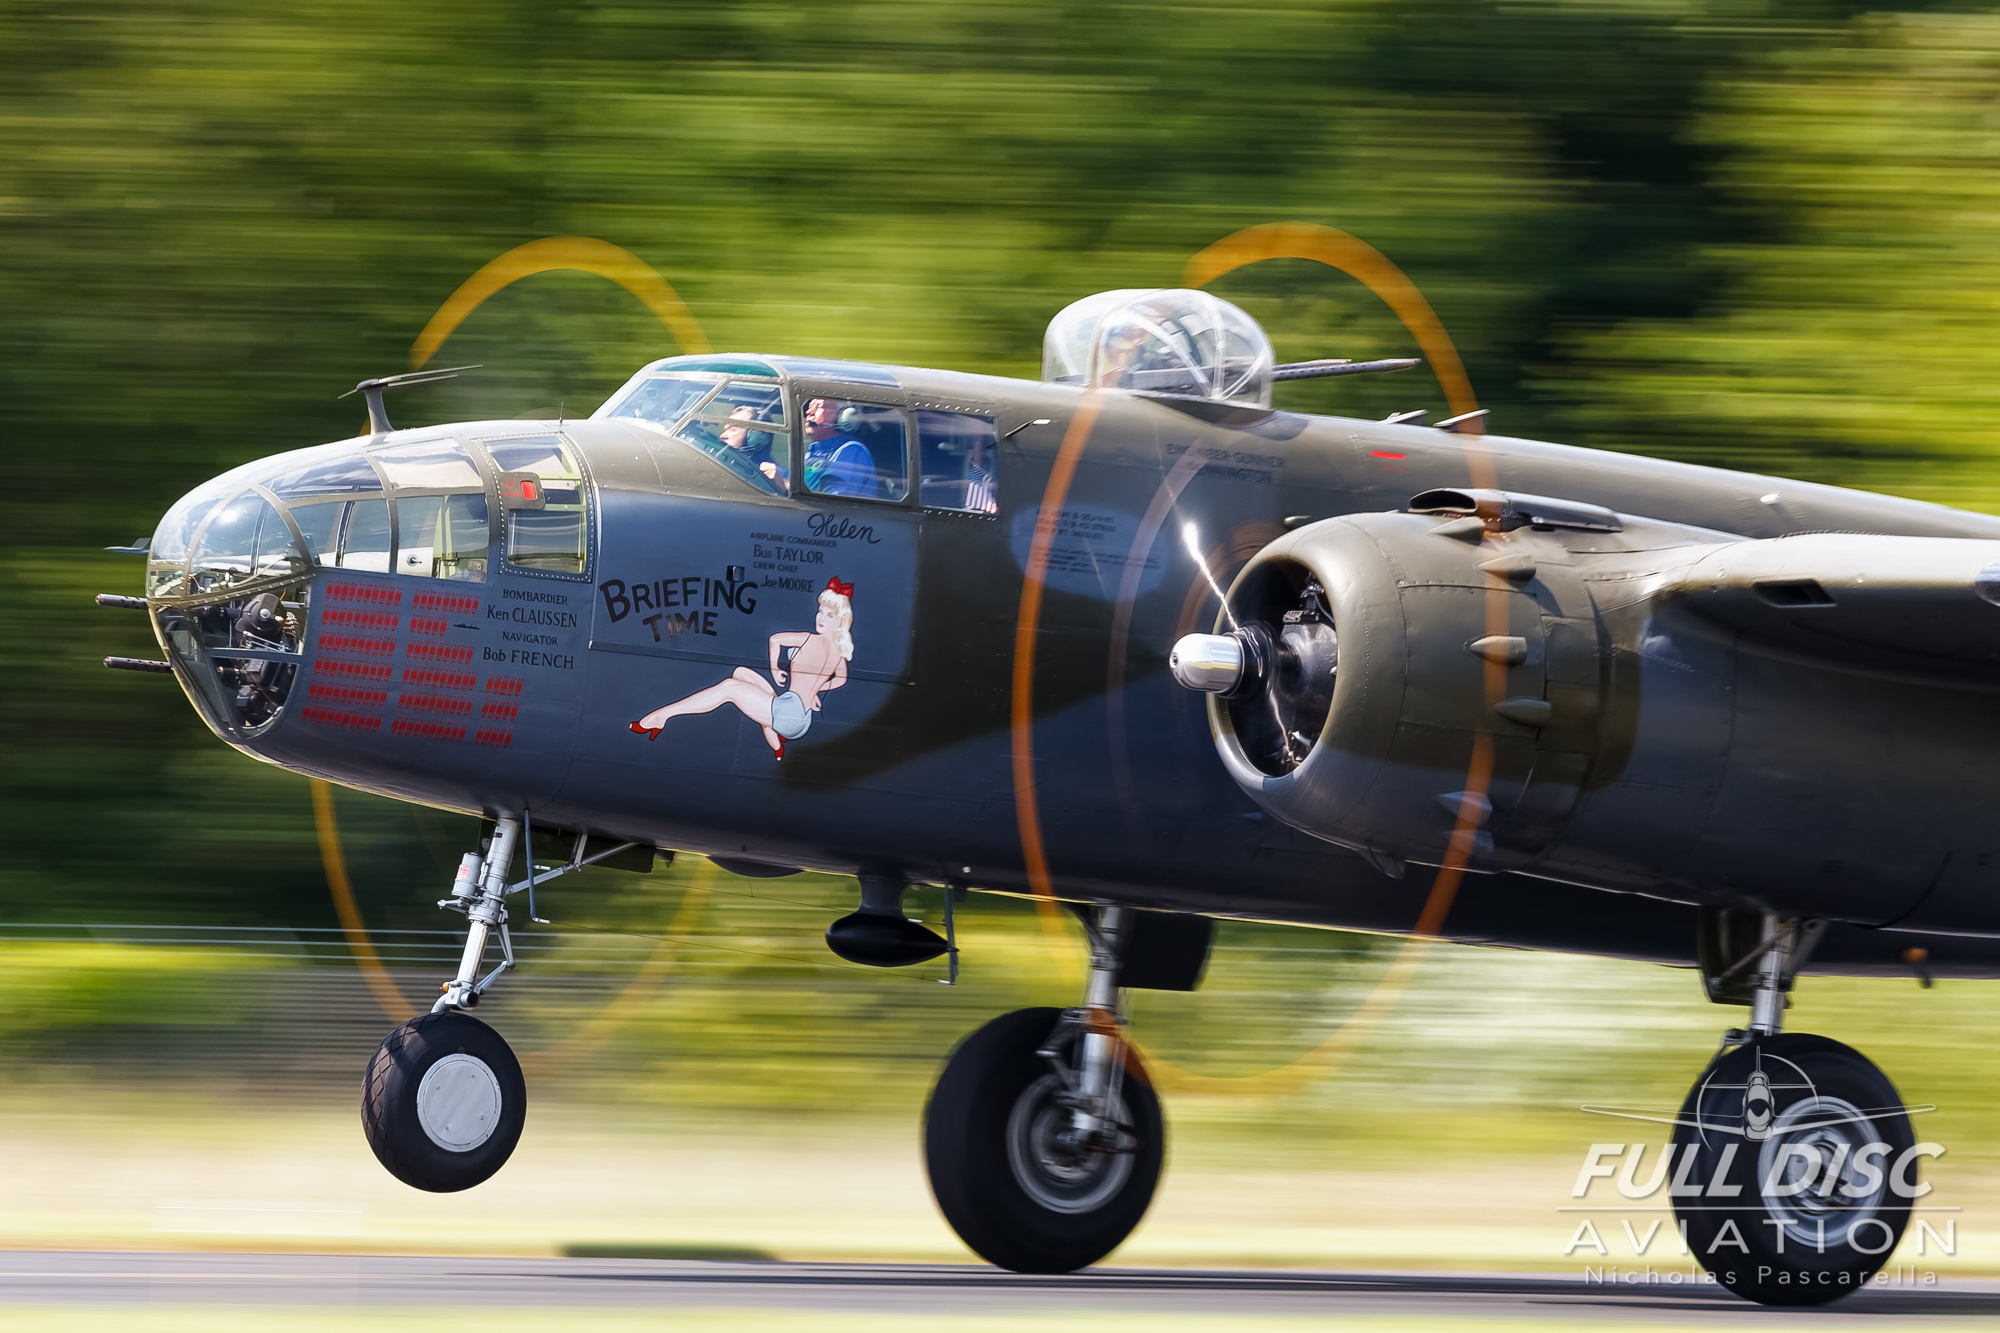 nickpascarella_nicholaspascarella_fulldiscaviation_aircraft_b25_mitchelbomber_takeoff.jpg